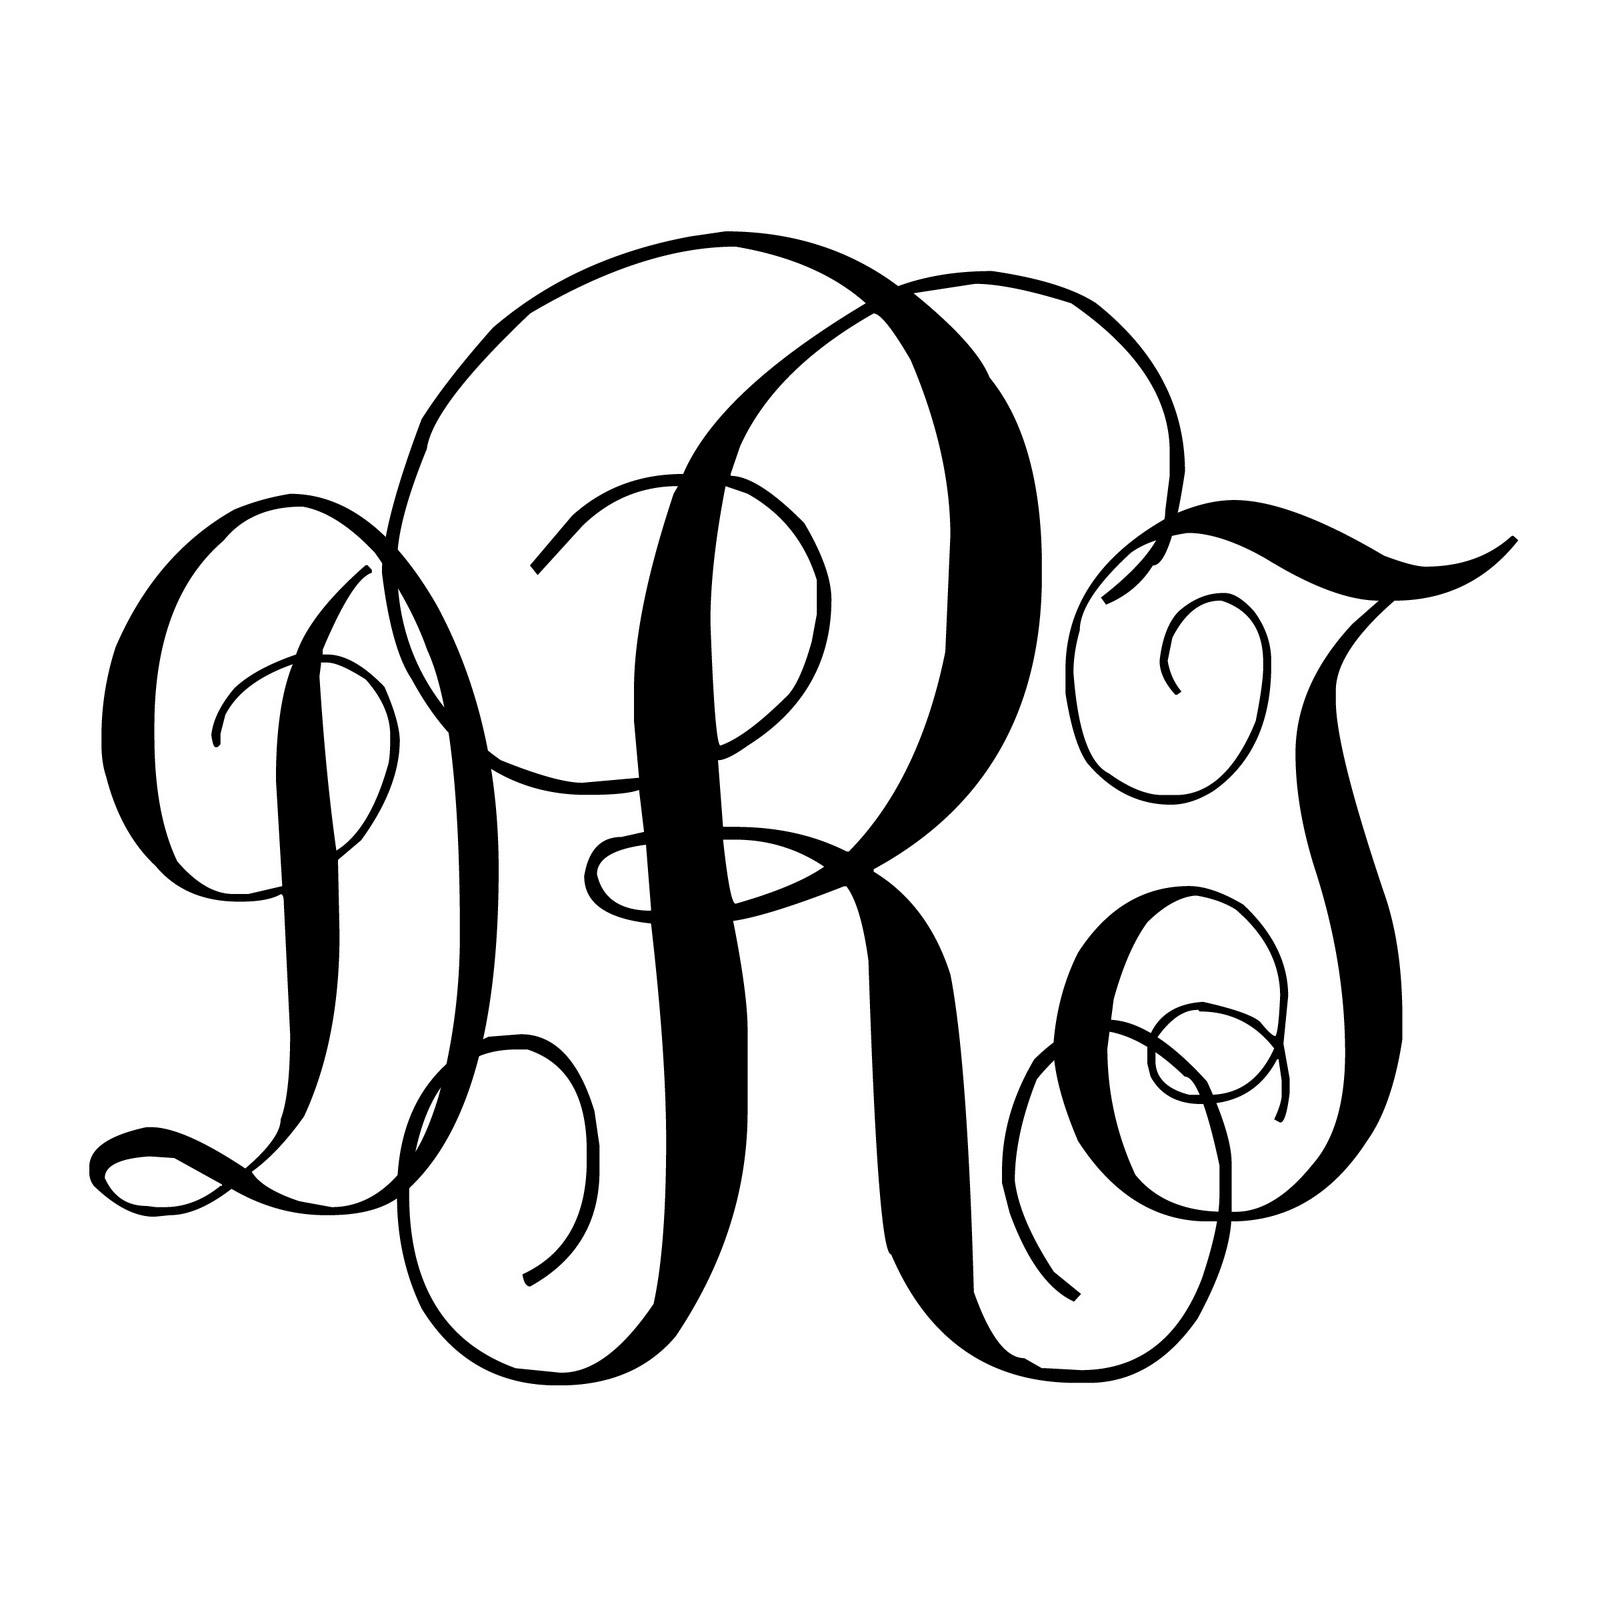 N And S Monogram